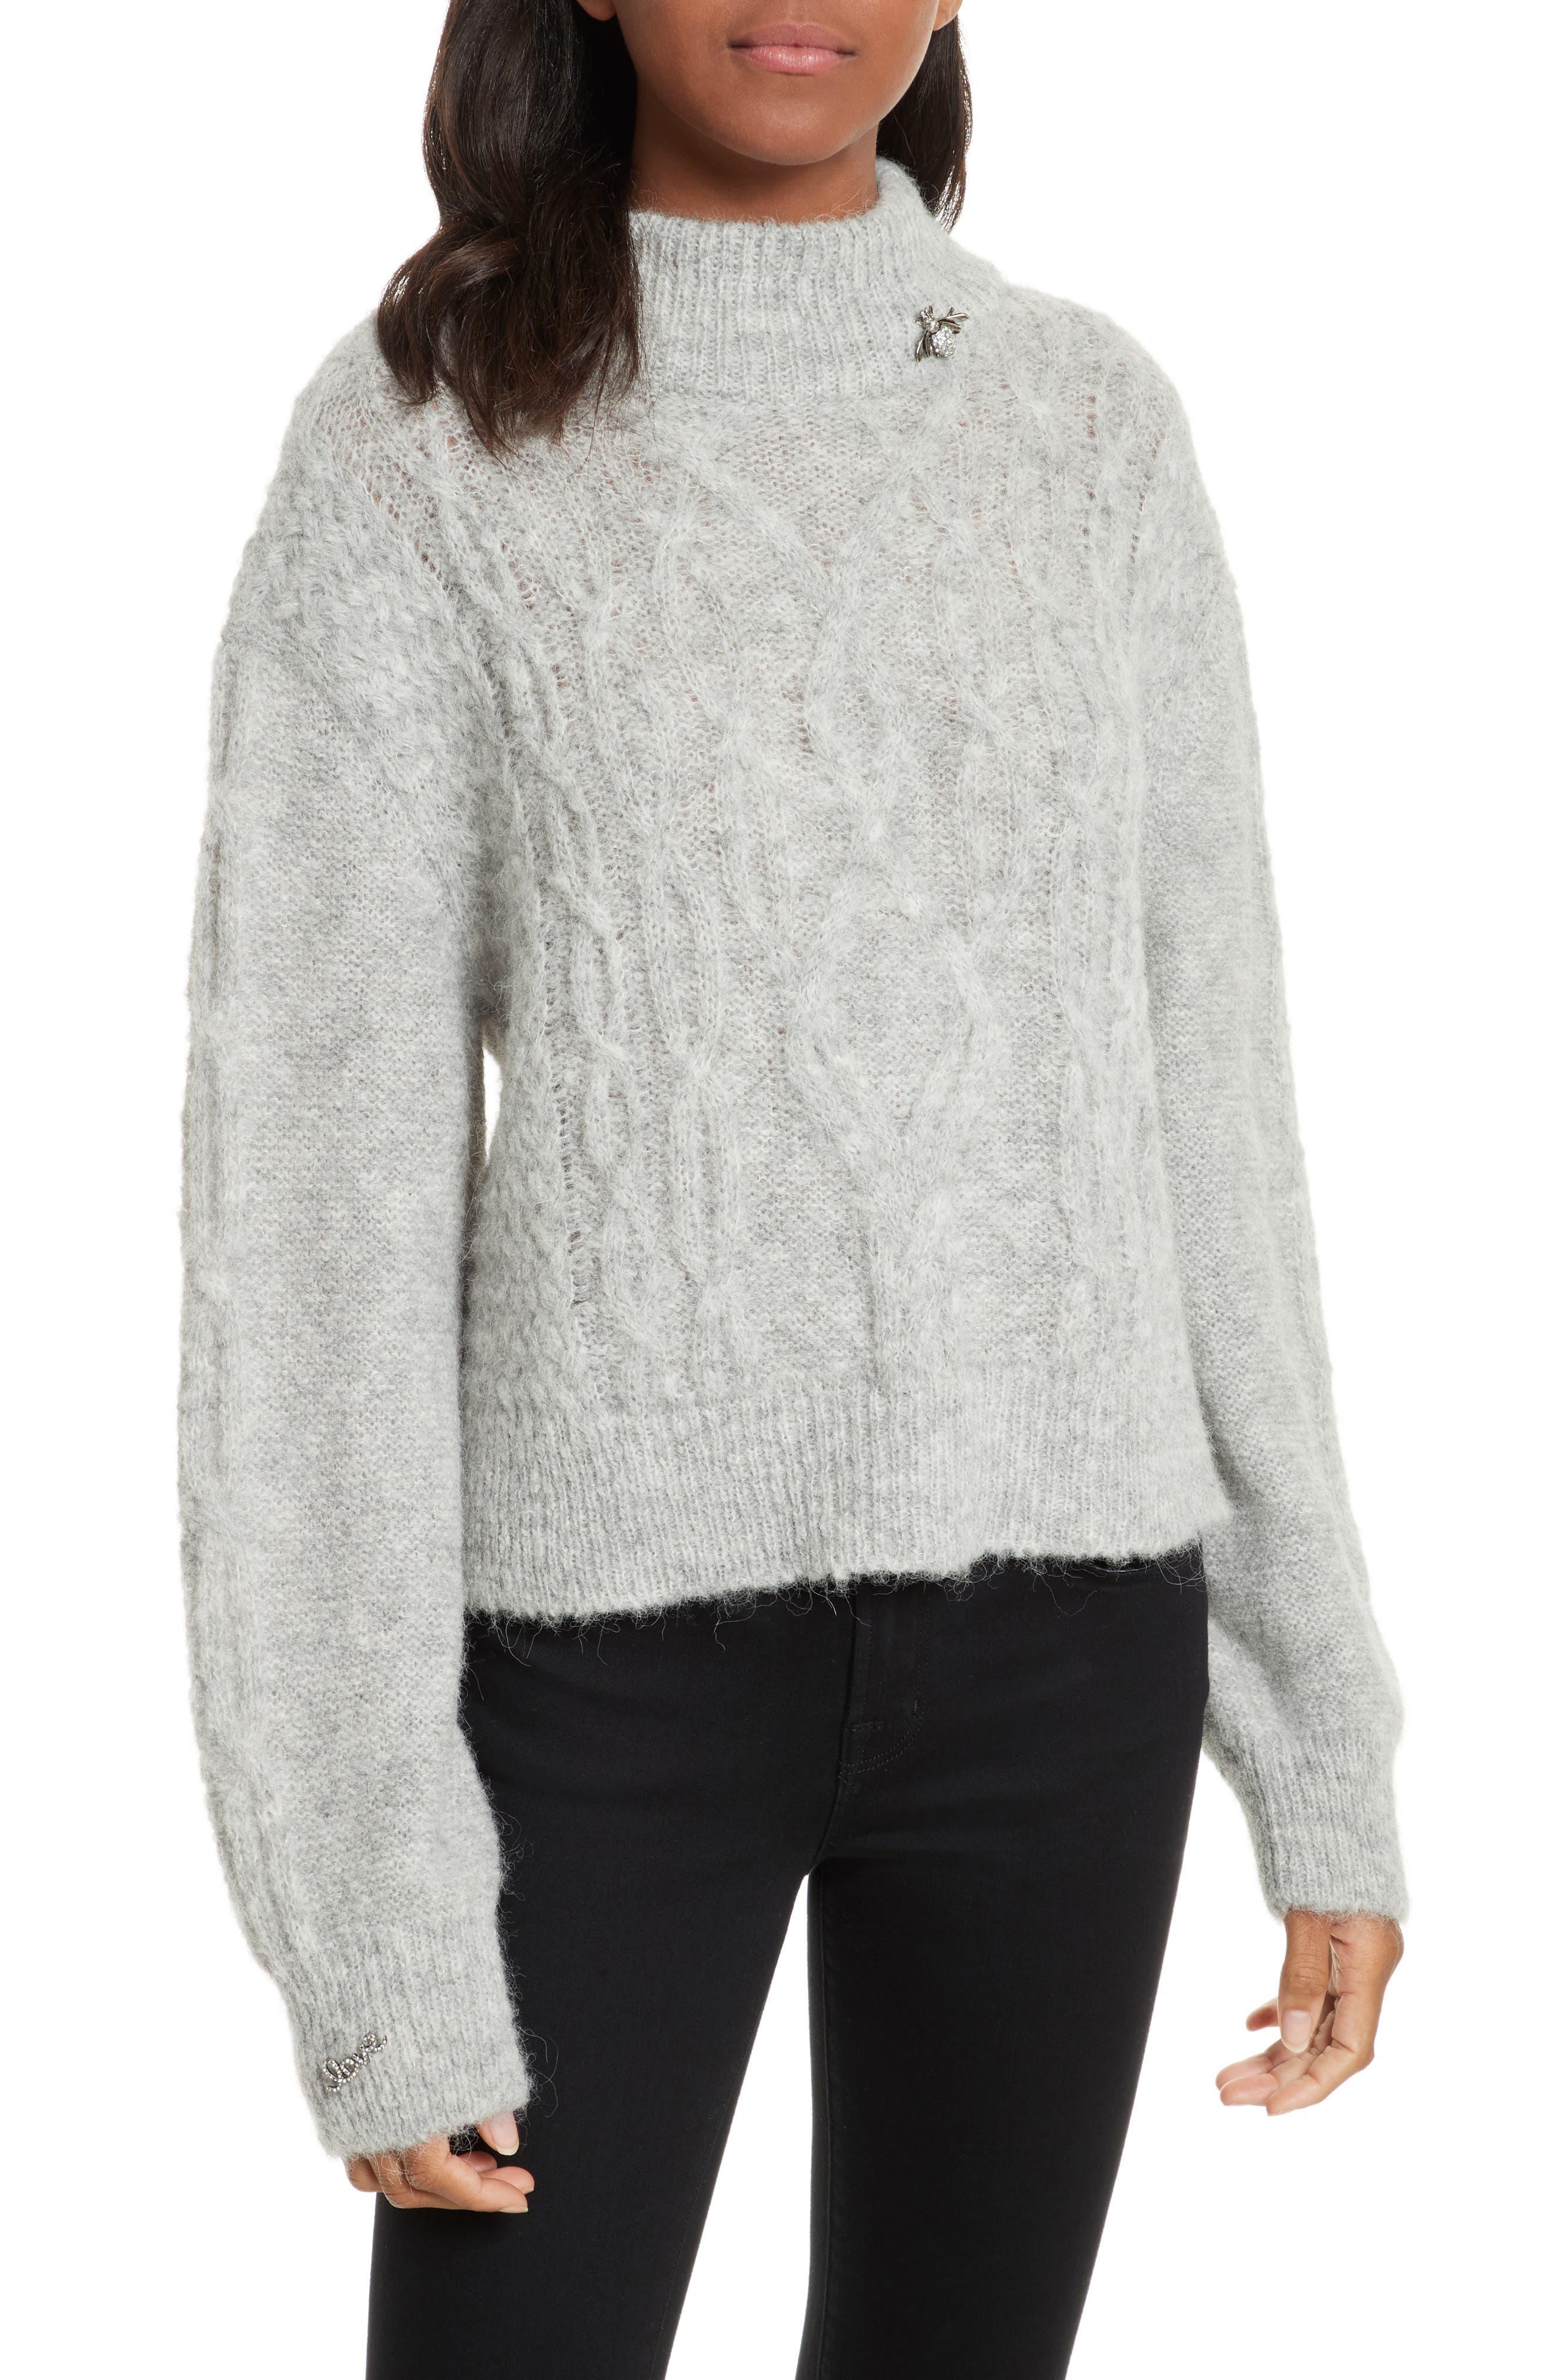 Garlan Mock Neck Sweater,                         Main,                         color, Light Heather Grey